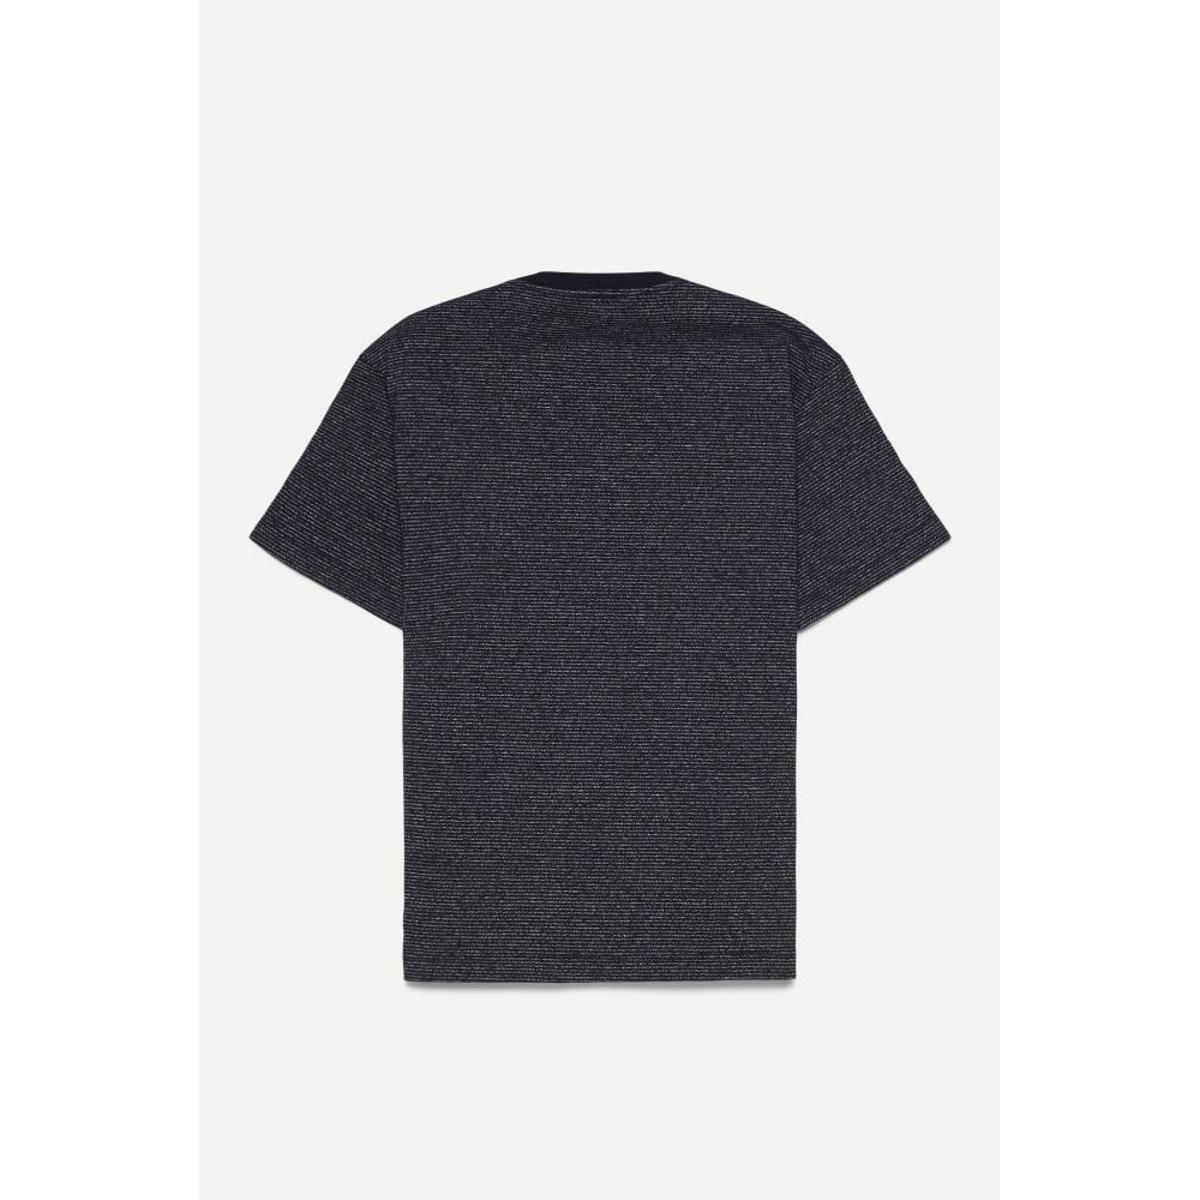 Camiseta Infantil Reserva Mini Sm Basica Tinturada Masculina - Preto